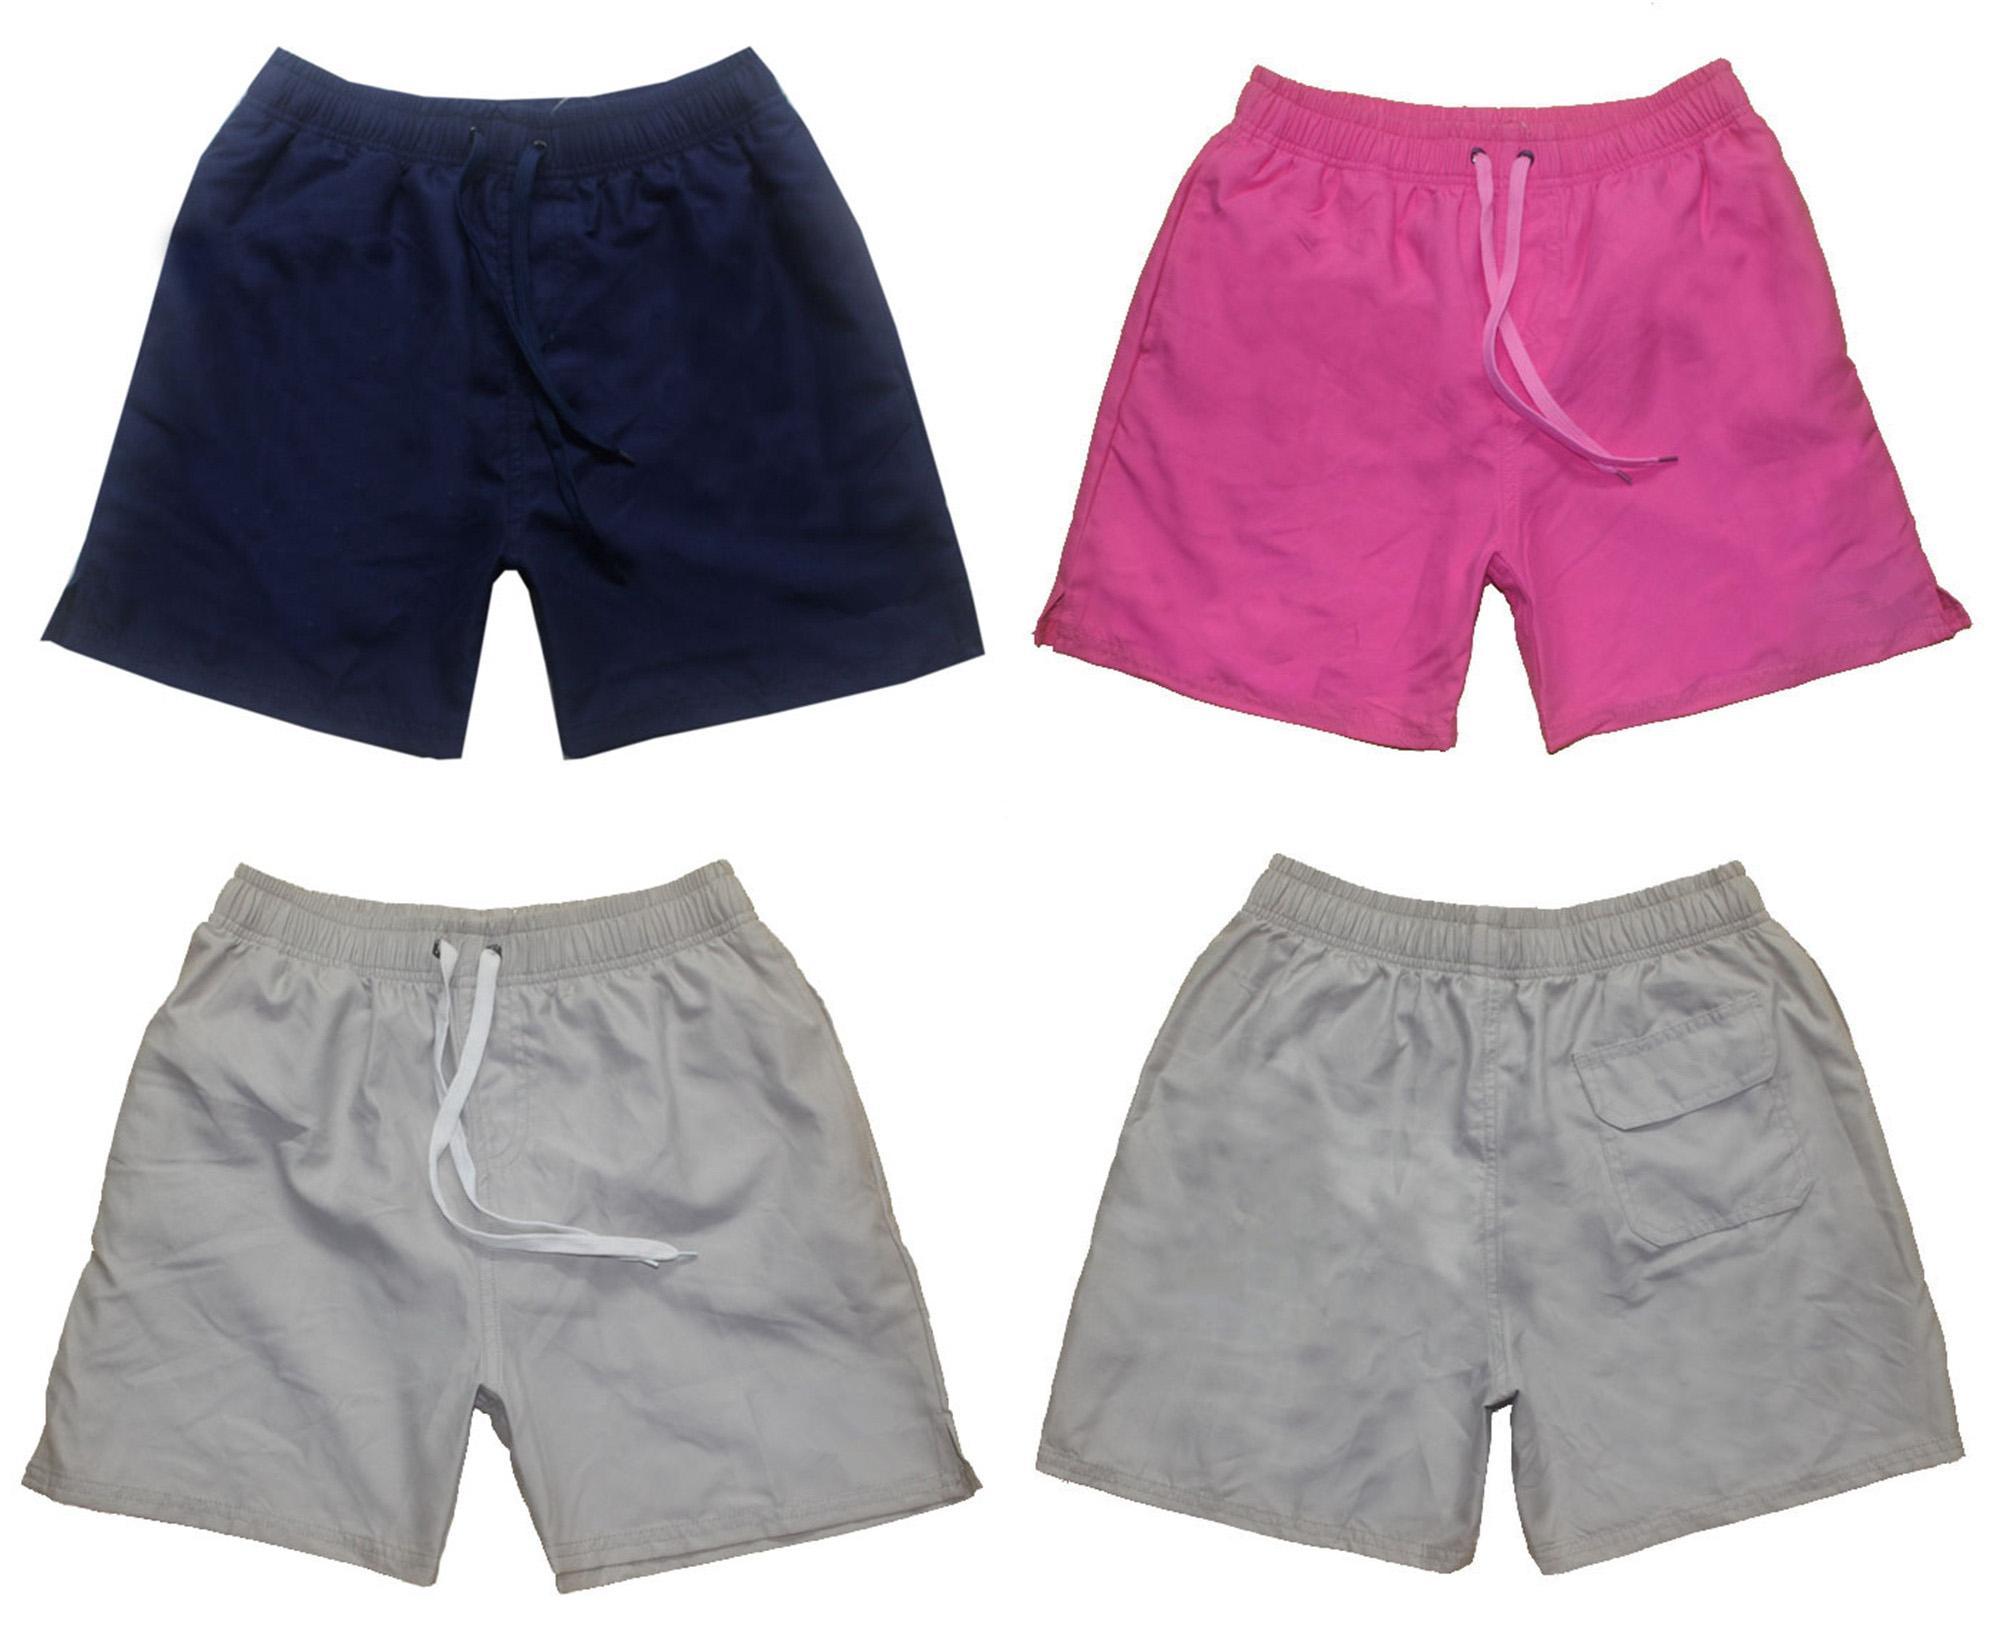 Brand New Polyester Relaxed Mens Bermudas Shorts Board Shorts Beachshorts Swim Trunks Swimwear Swim Pants Quick Dry Surf Pants Leisure Pants